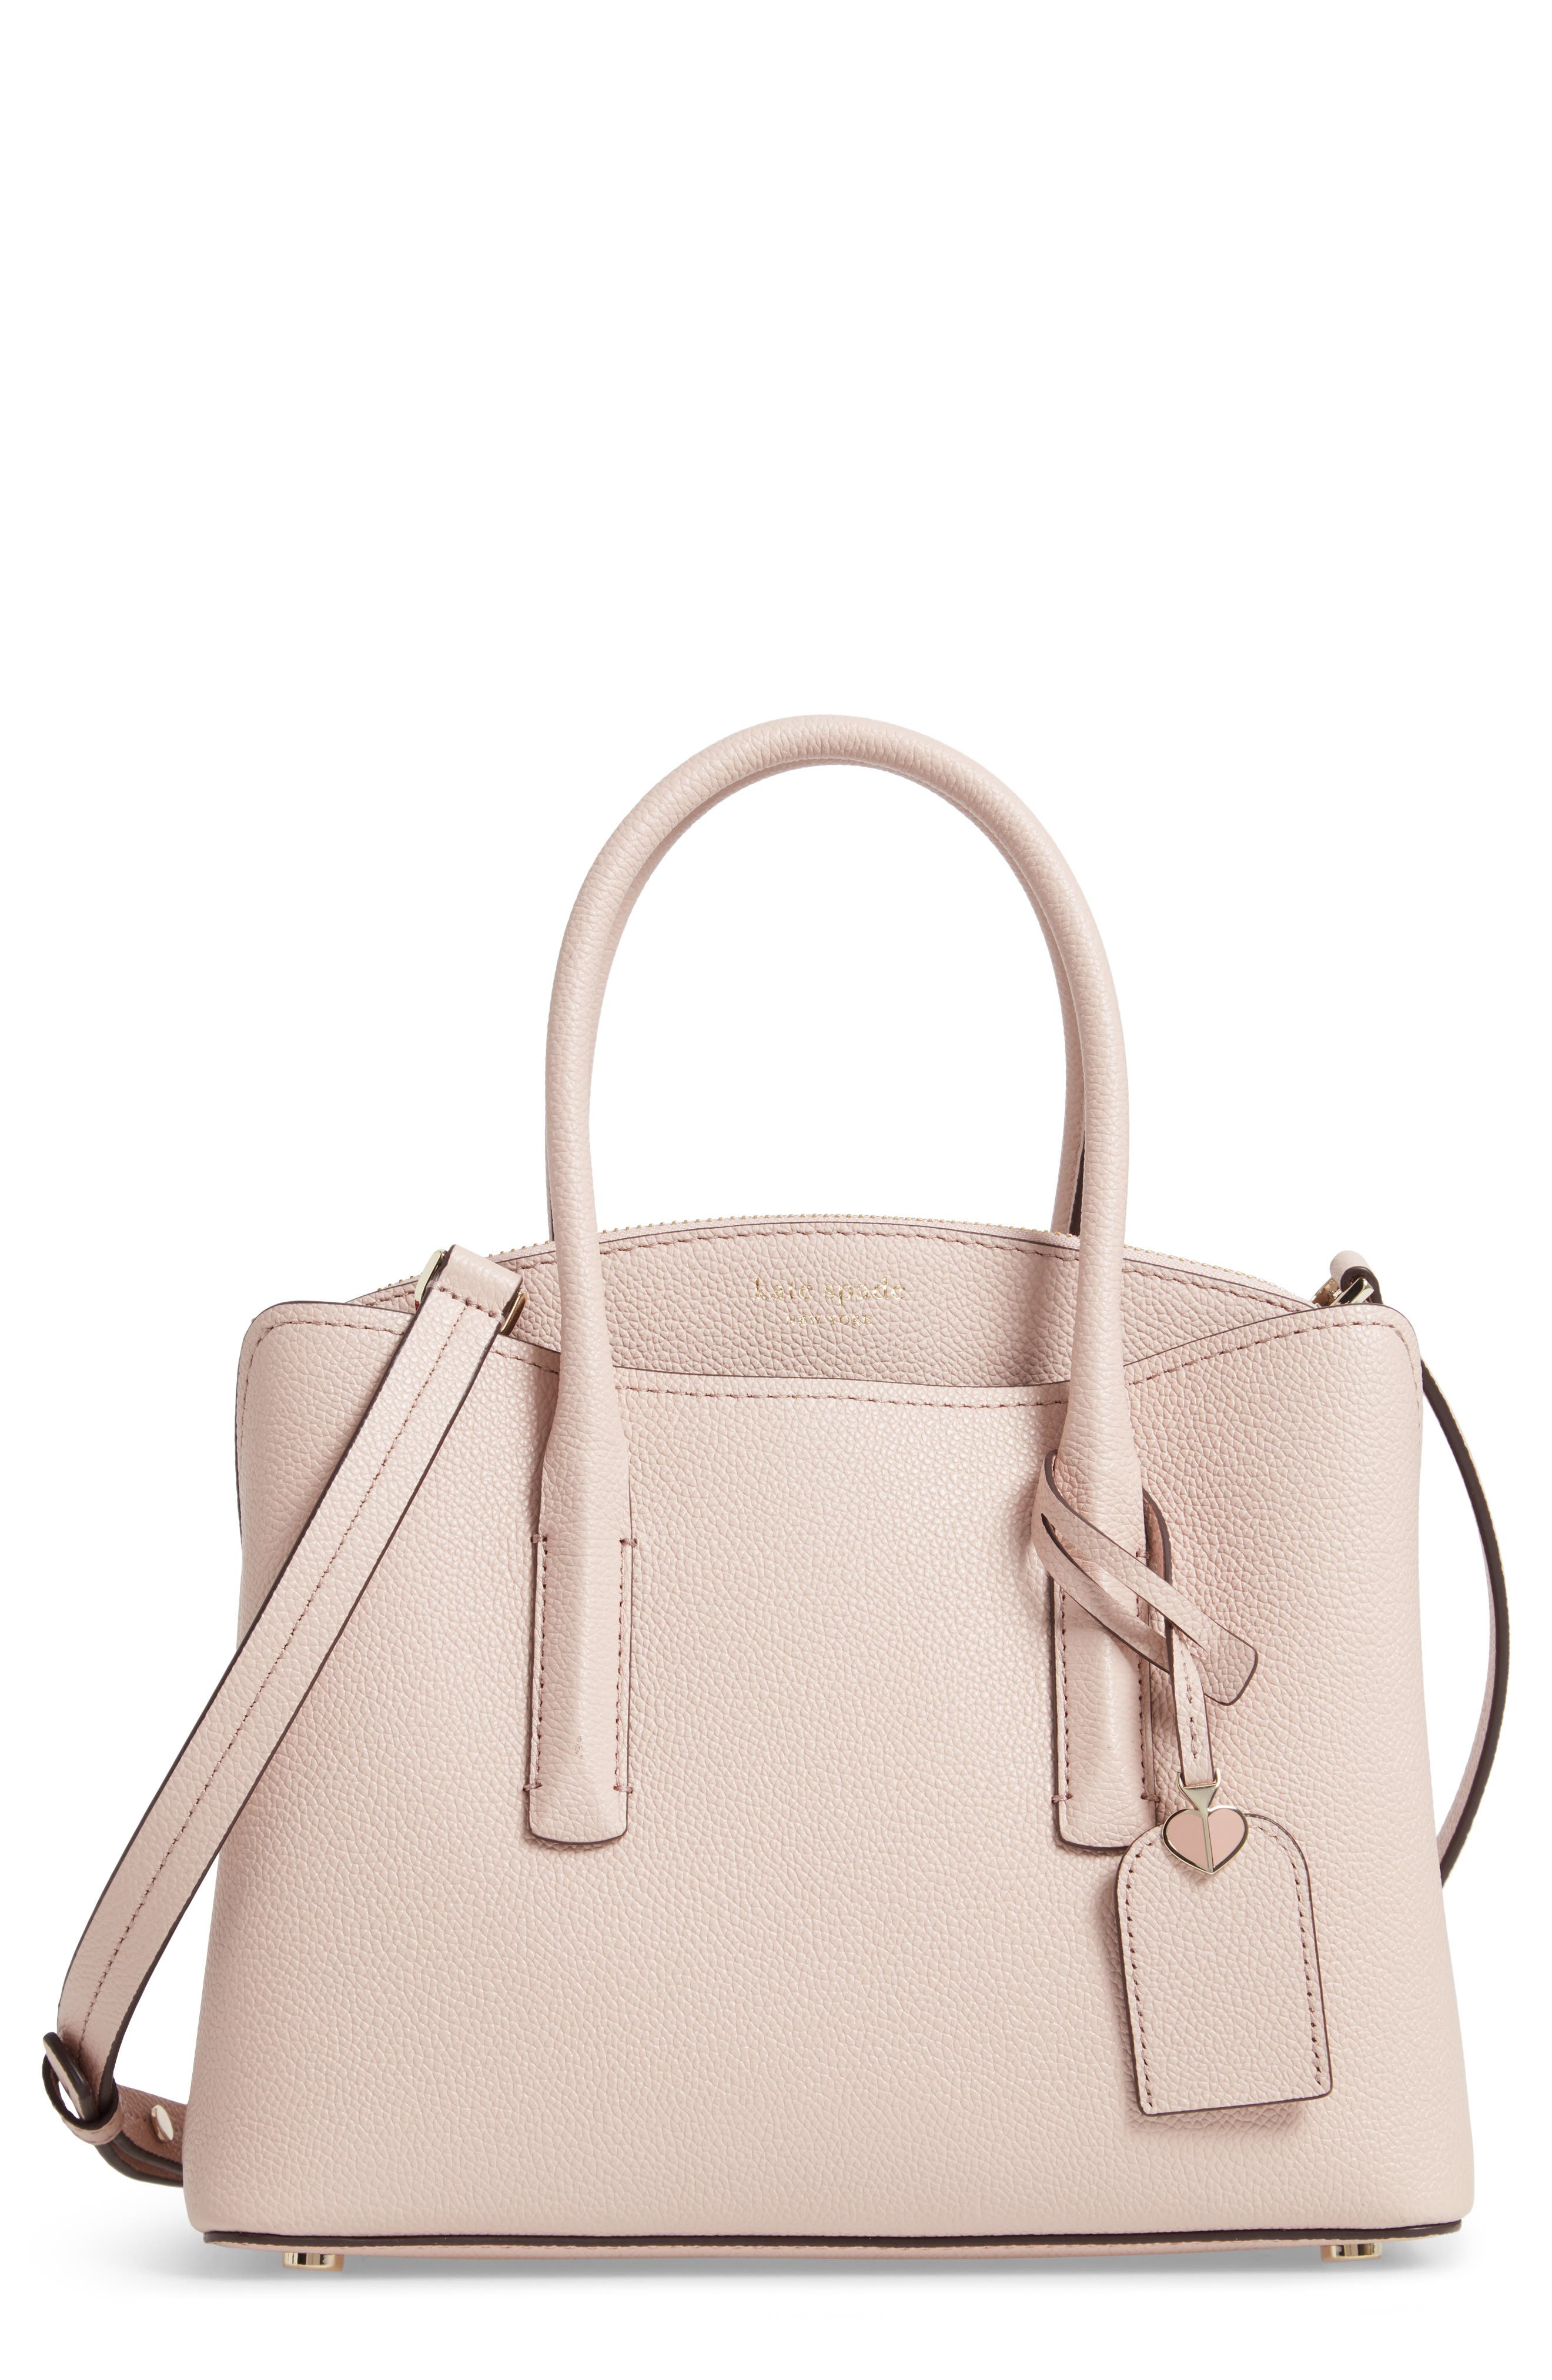 a957e74dfc16 Women s Crossbody Bags New Arrivals  Clothing